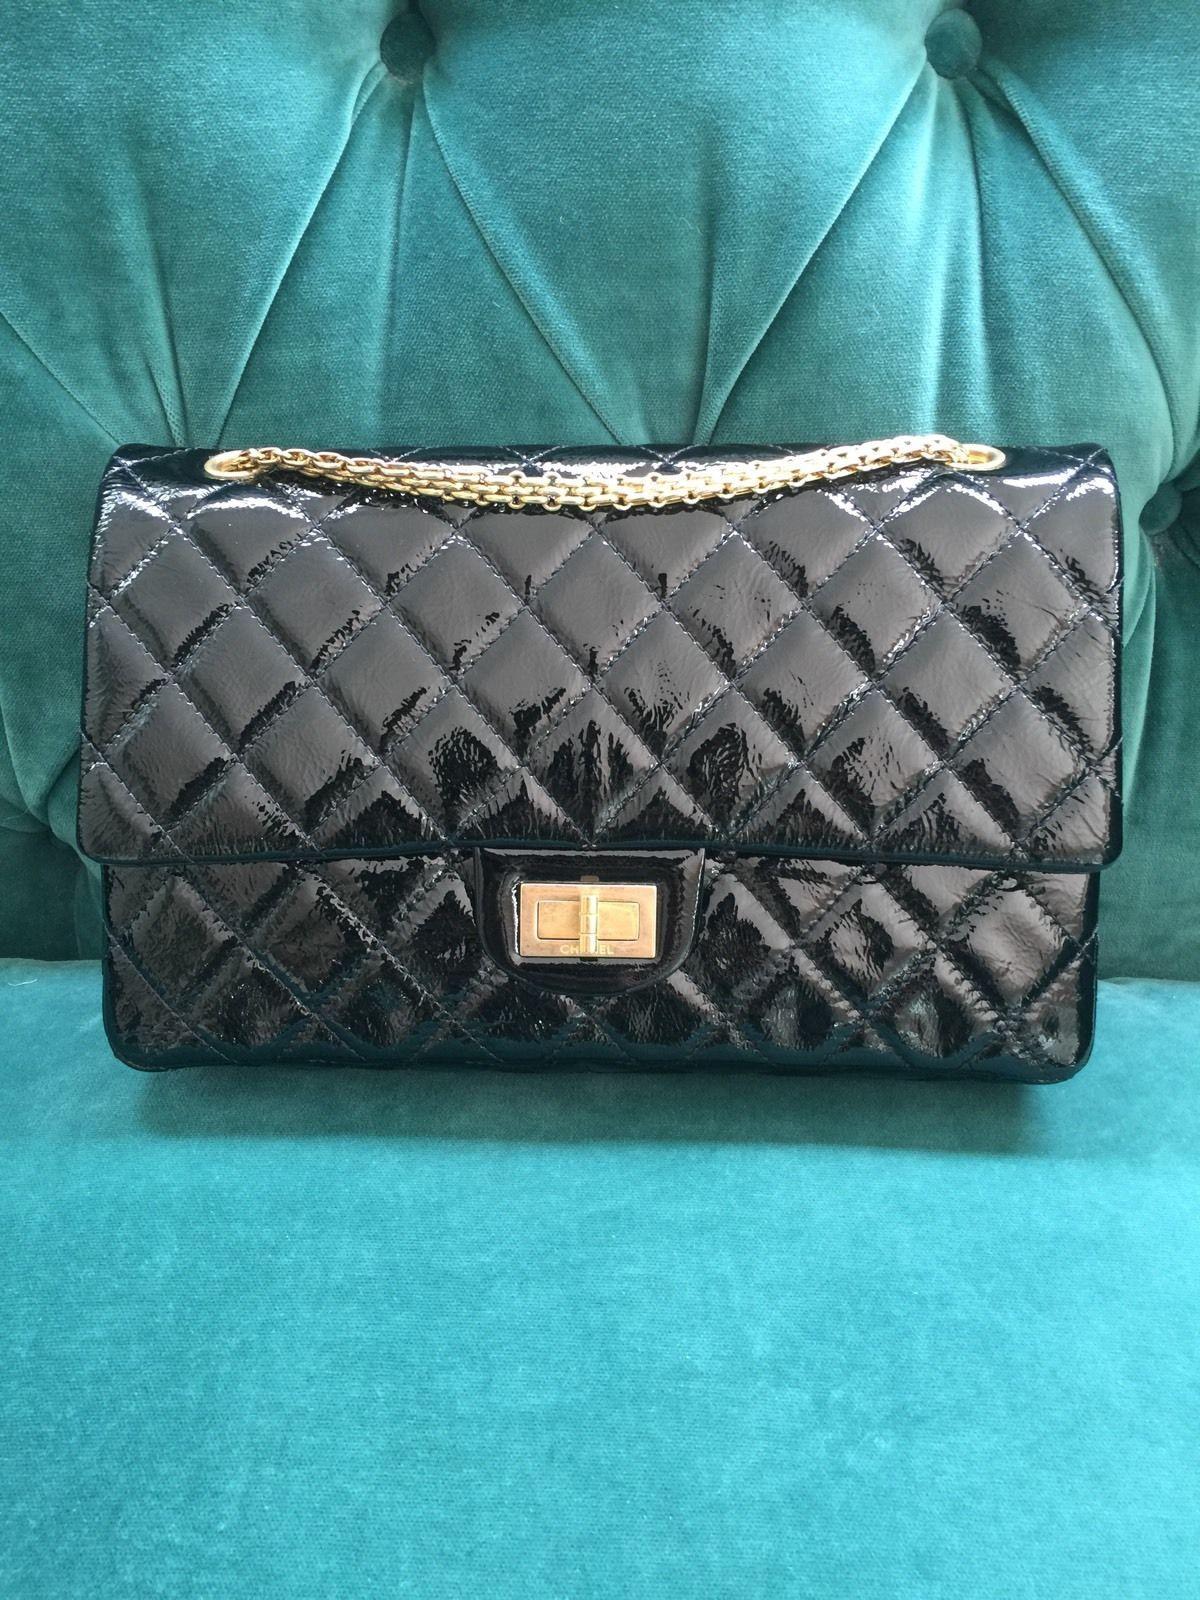 CHANEL 07 Black Patent Reissue 2.55 Double Flap Classic Bag 227